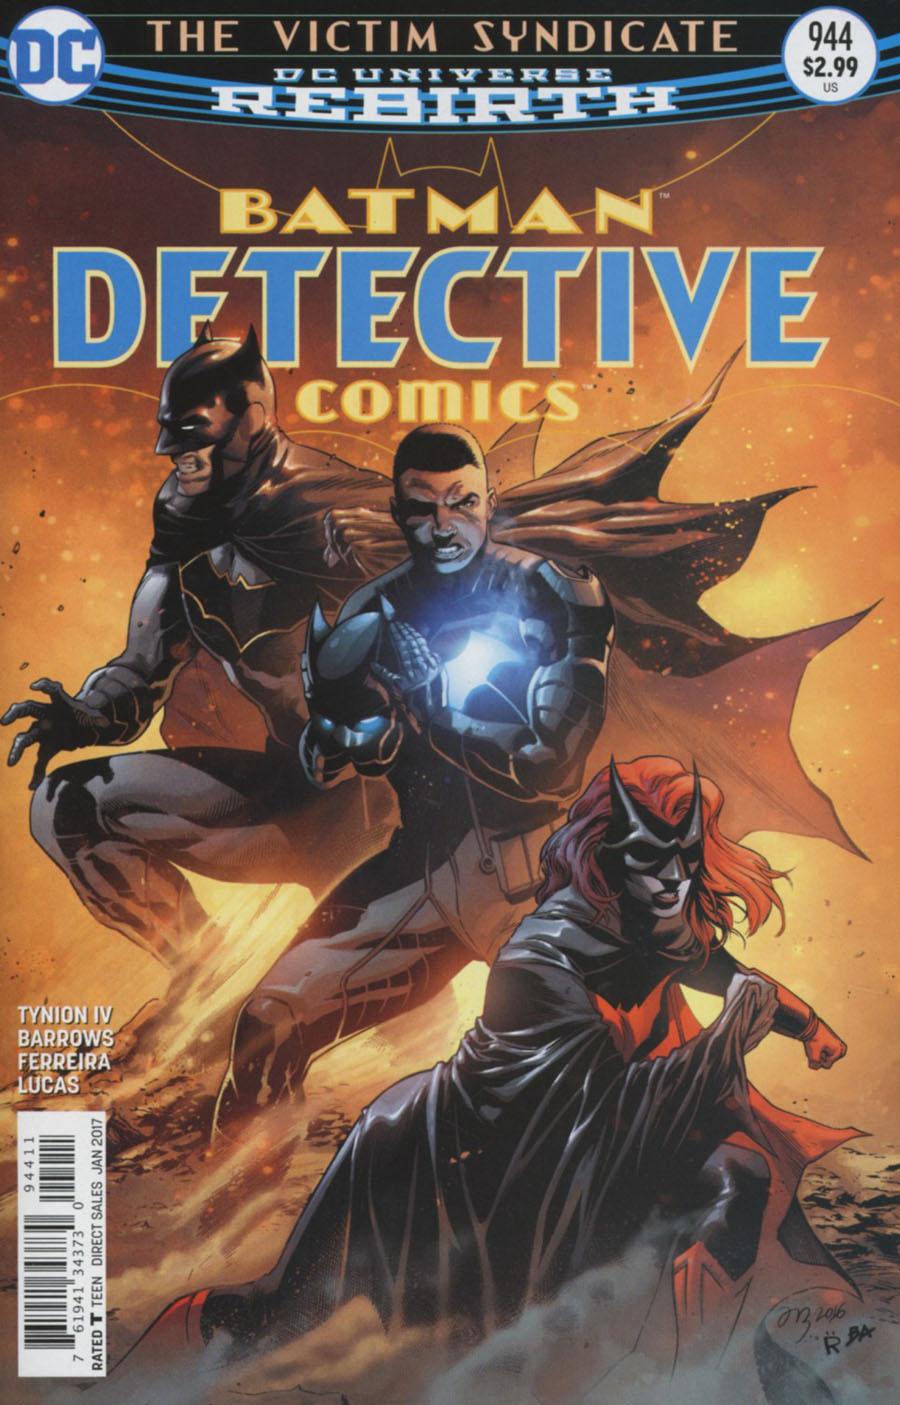 Batman - Detective Comics 944 - The Victim Syndicate - part two